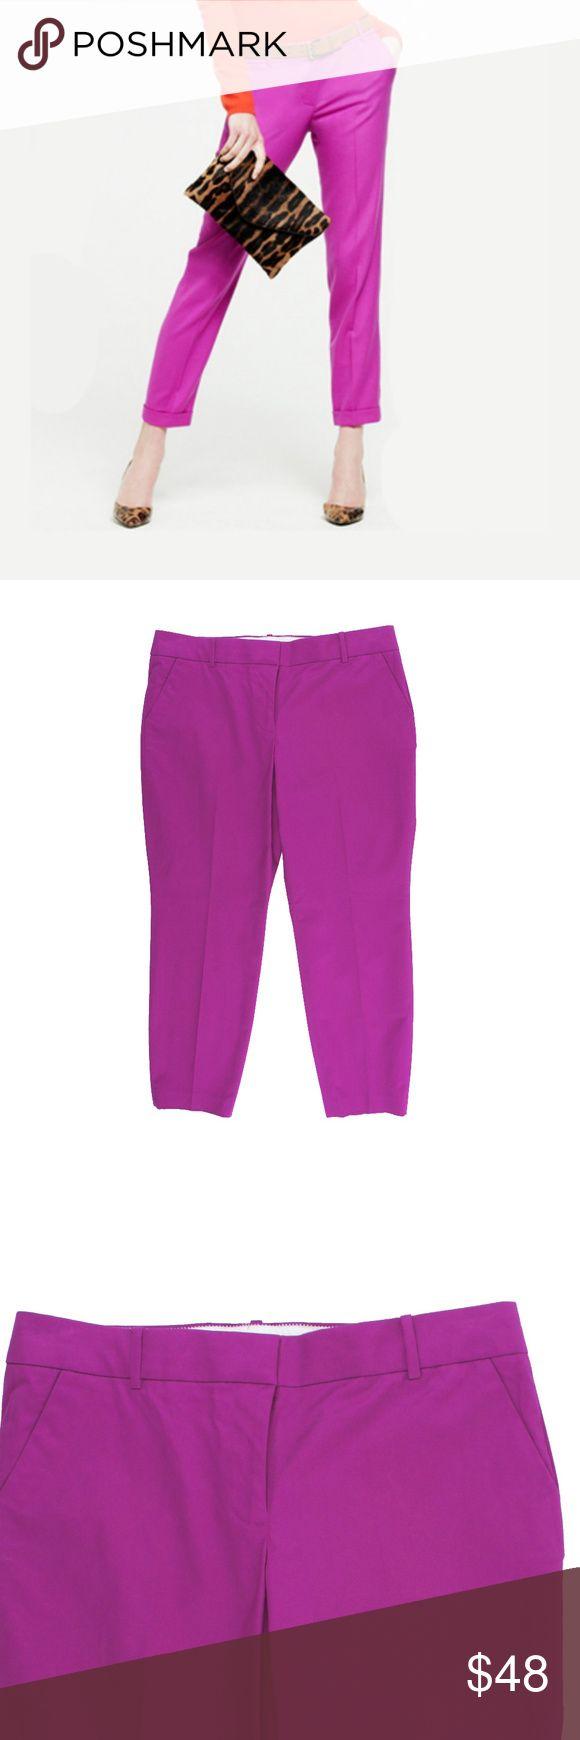 new jcrew cafe capri pants in bright dahlia pink - Purple Cafe Ideas